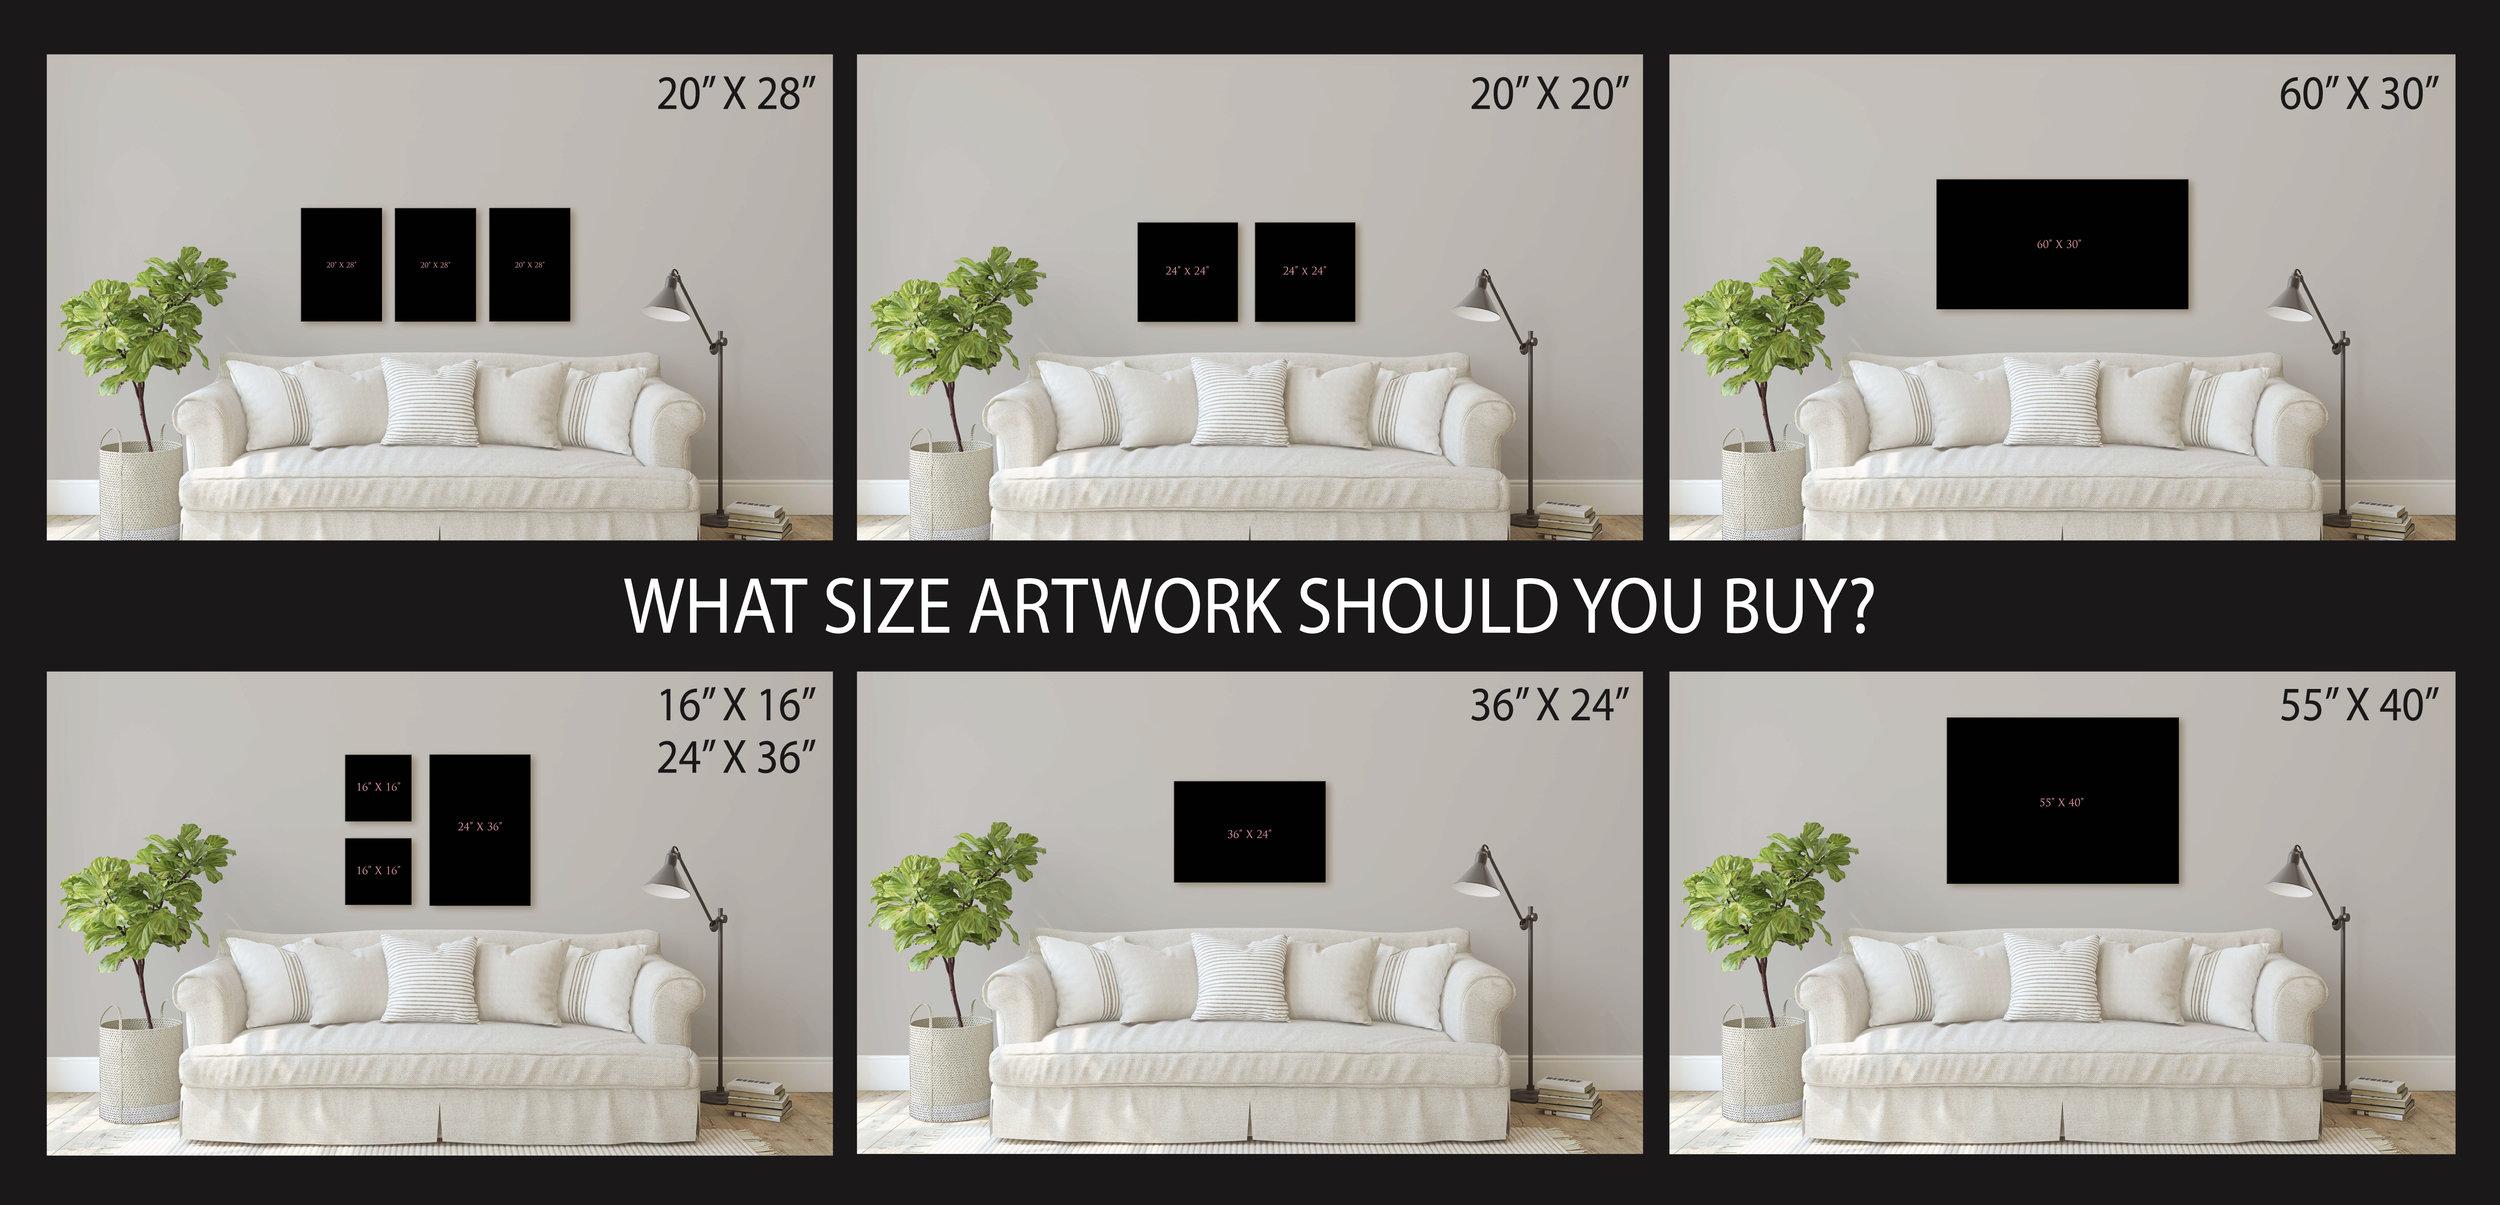 Artwork-Size-Comparison.jpg